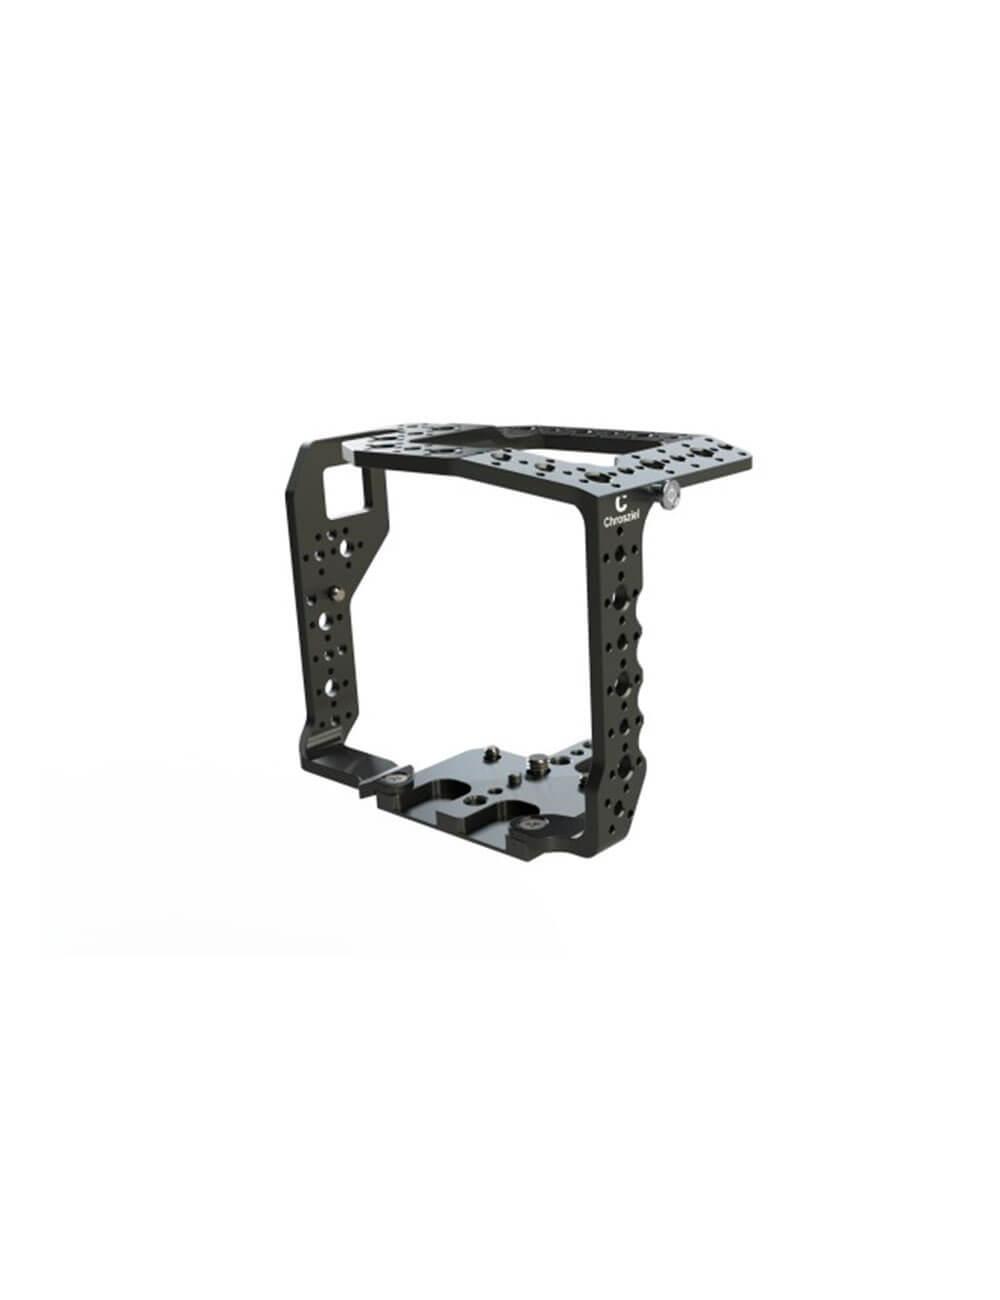 Chrosziel Cage para Canon EOS C70